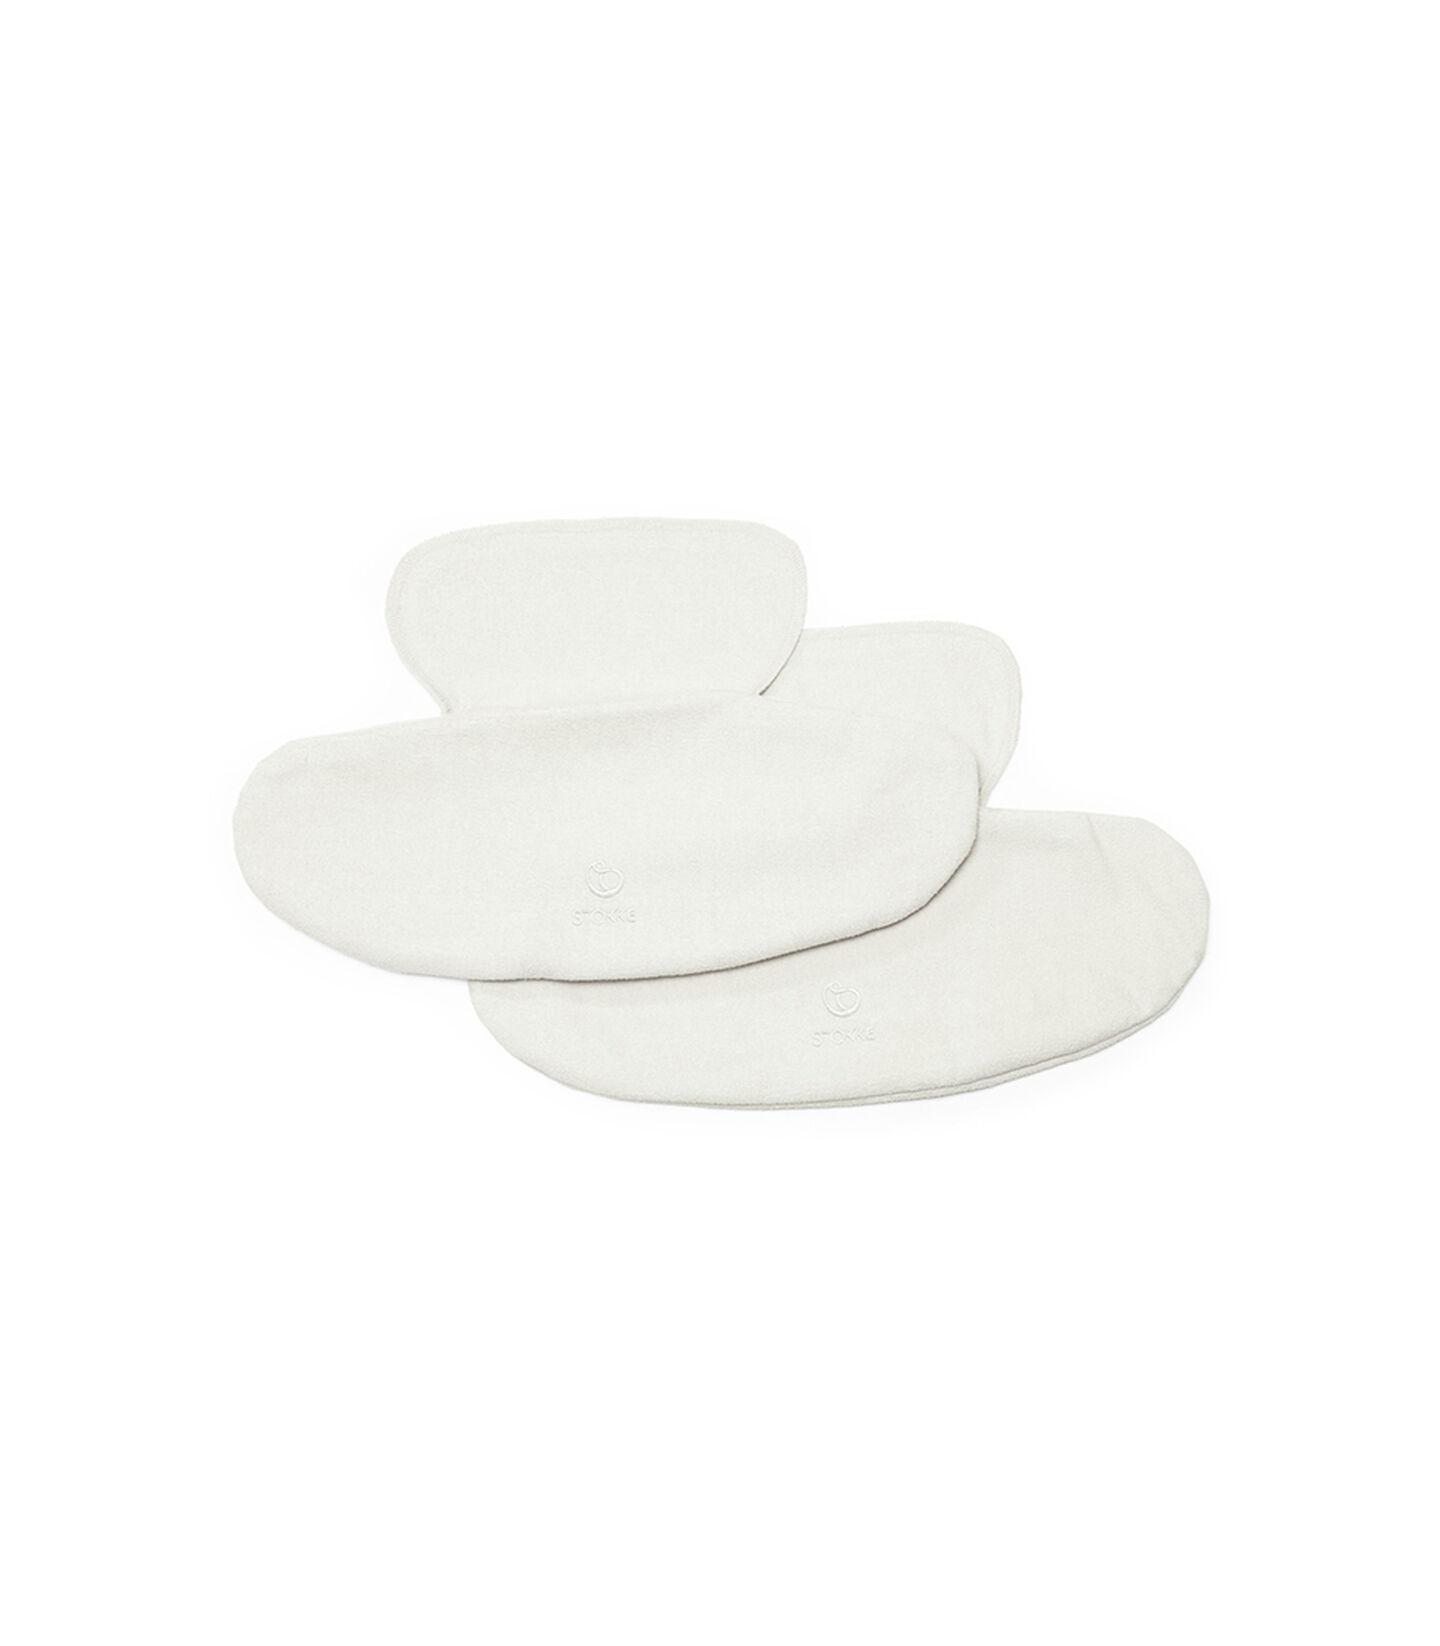 Stokke® MyCarrier™ Slab in kleur White, White, mainview view 2